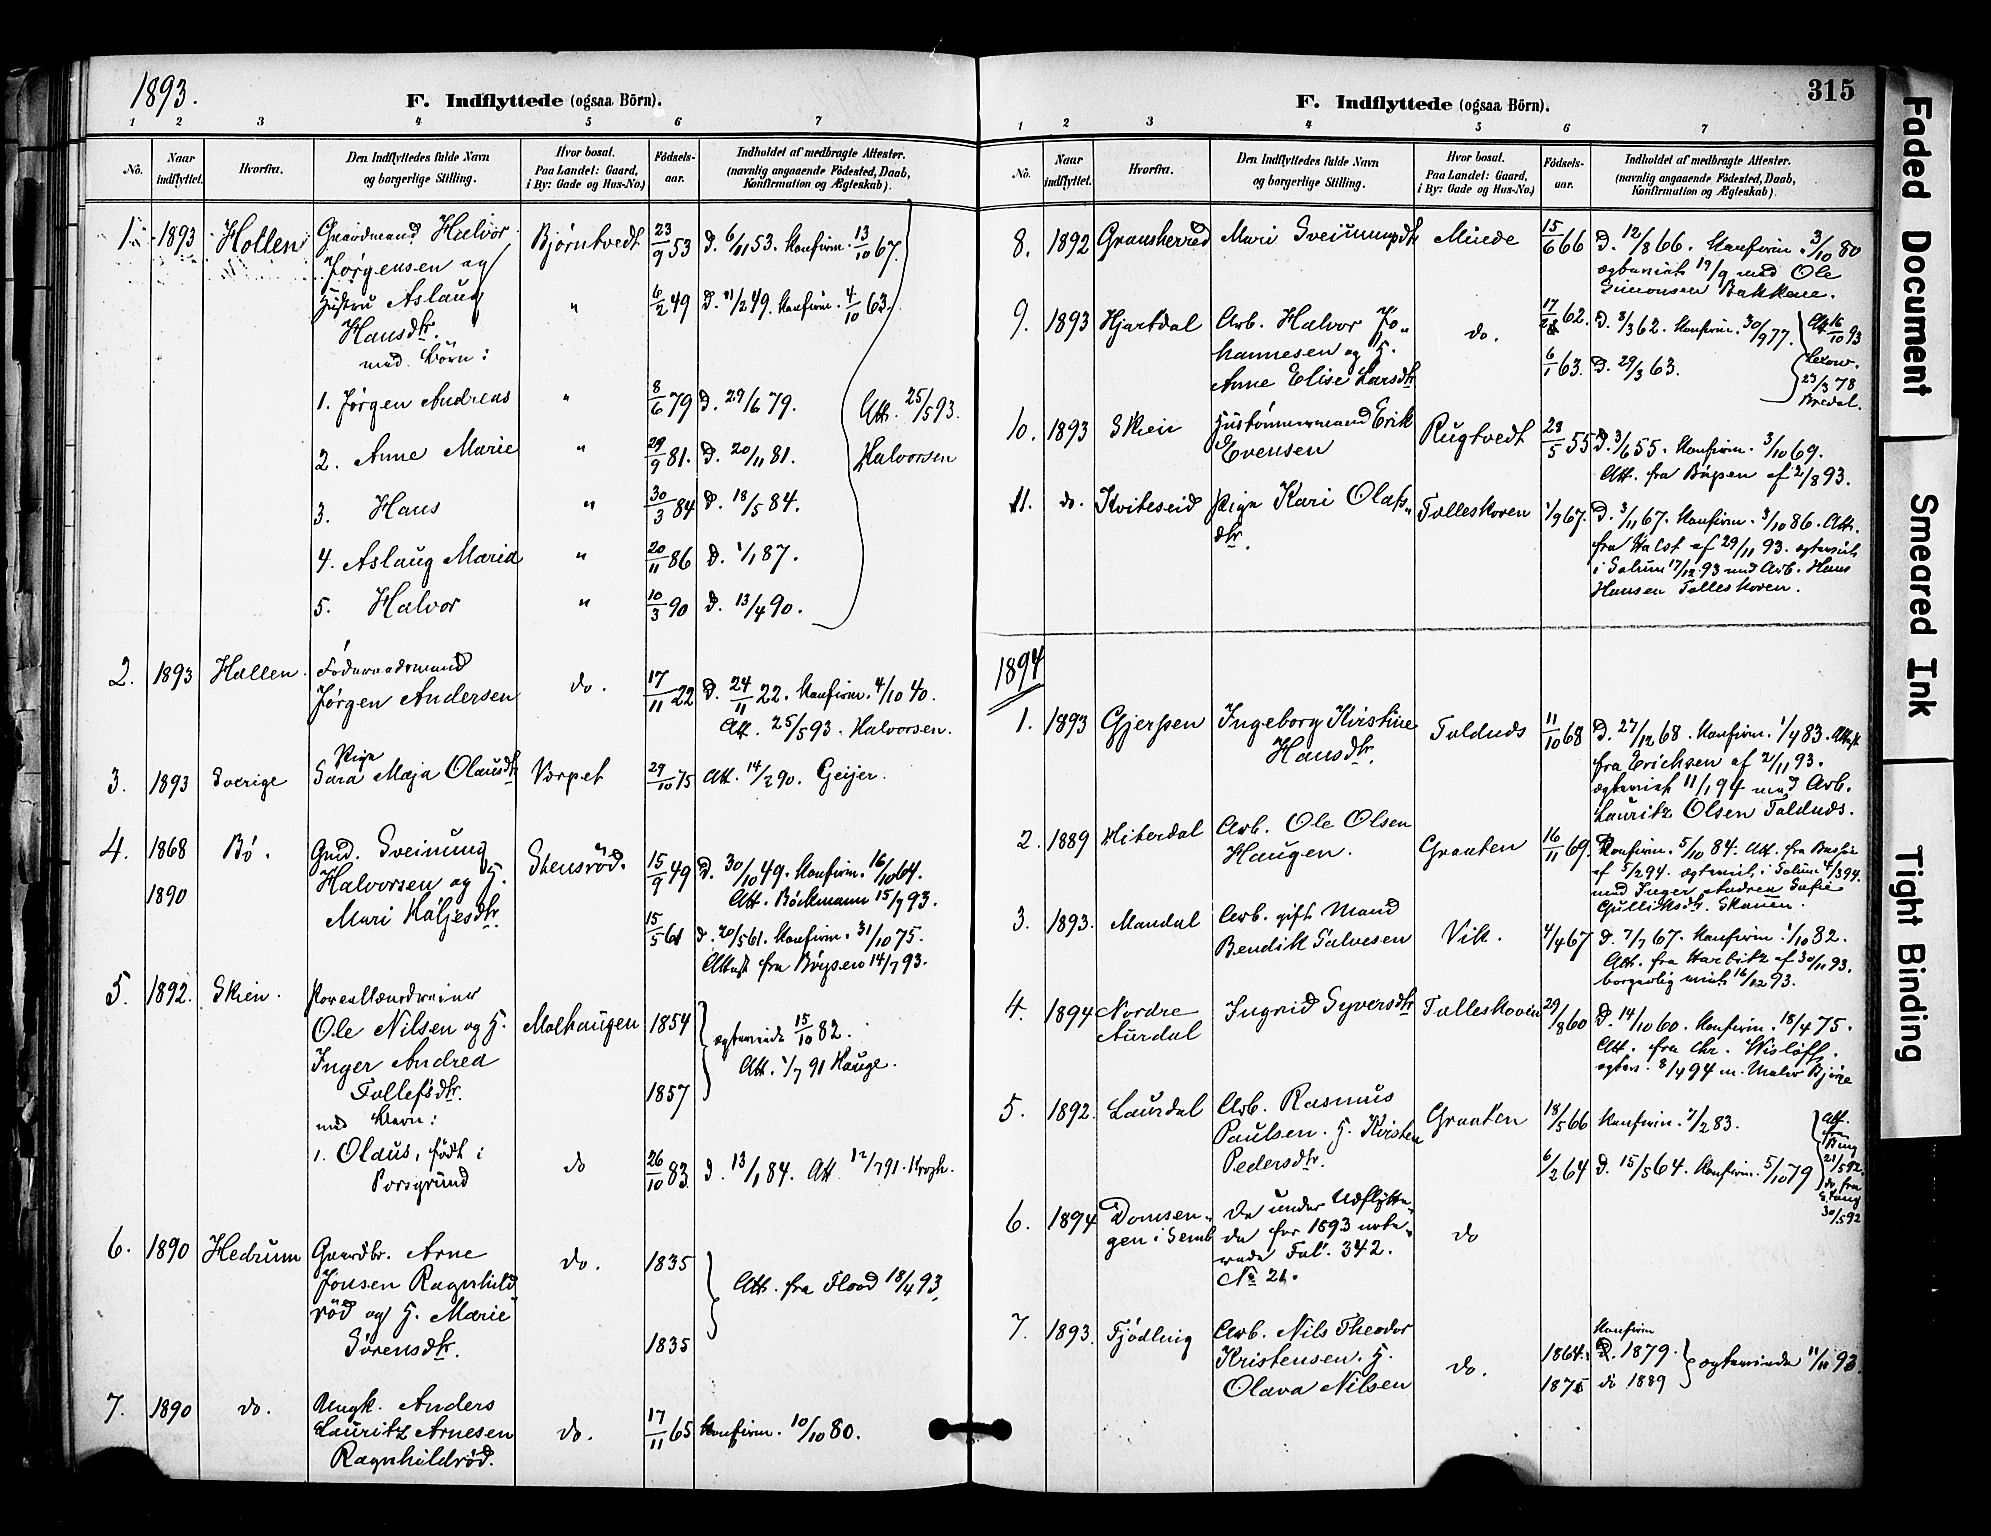 SAKO, Solum kirkebøker, F/Fa/L0010: Ministerialbok nr. I 10, 1888-1898, s. 315